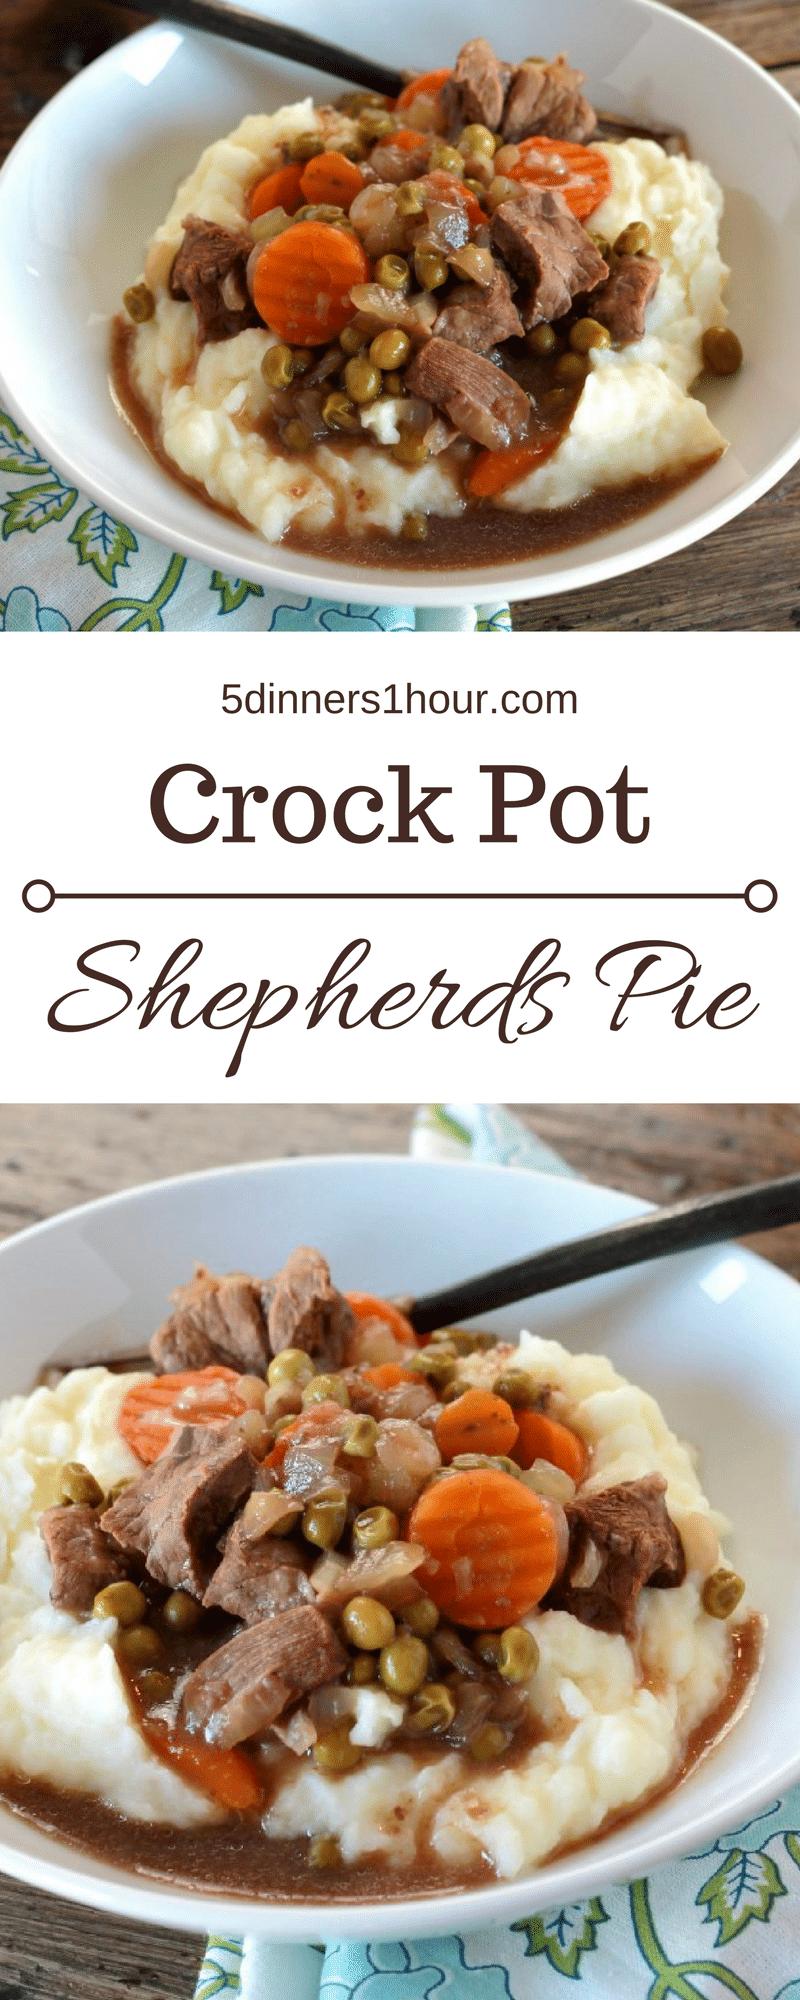 Slow Cooker Shepherds Pie - 5 Dinners In 1 Hour